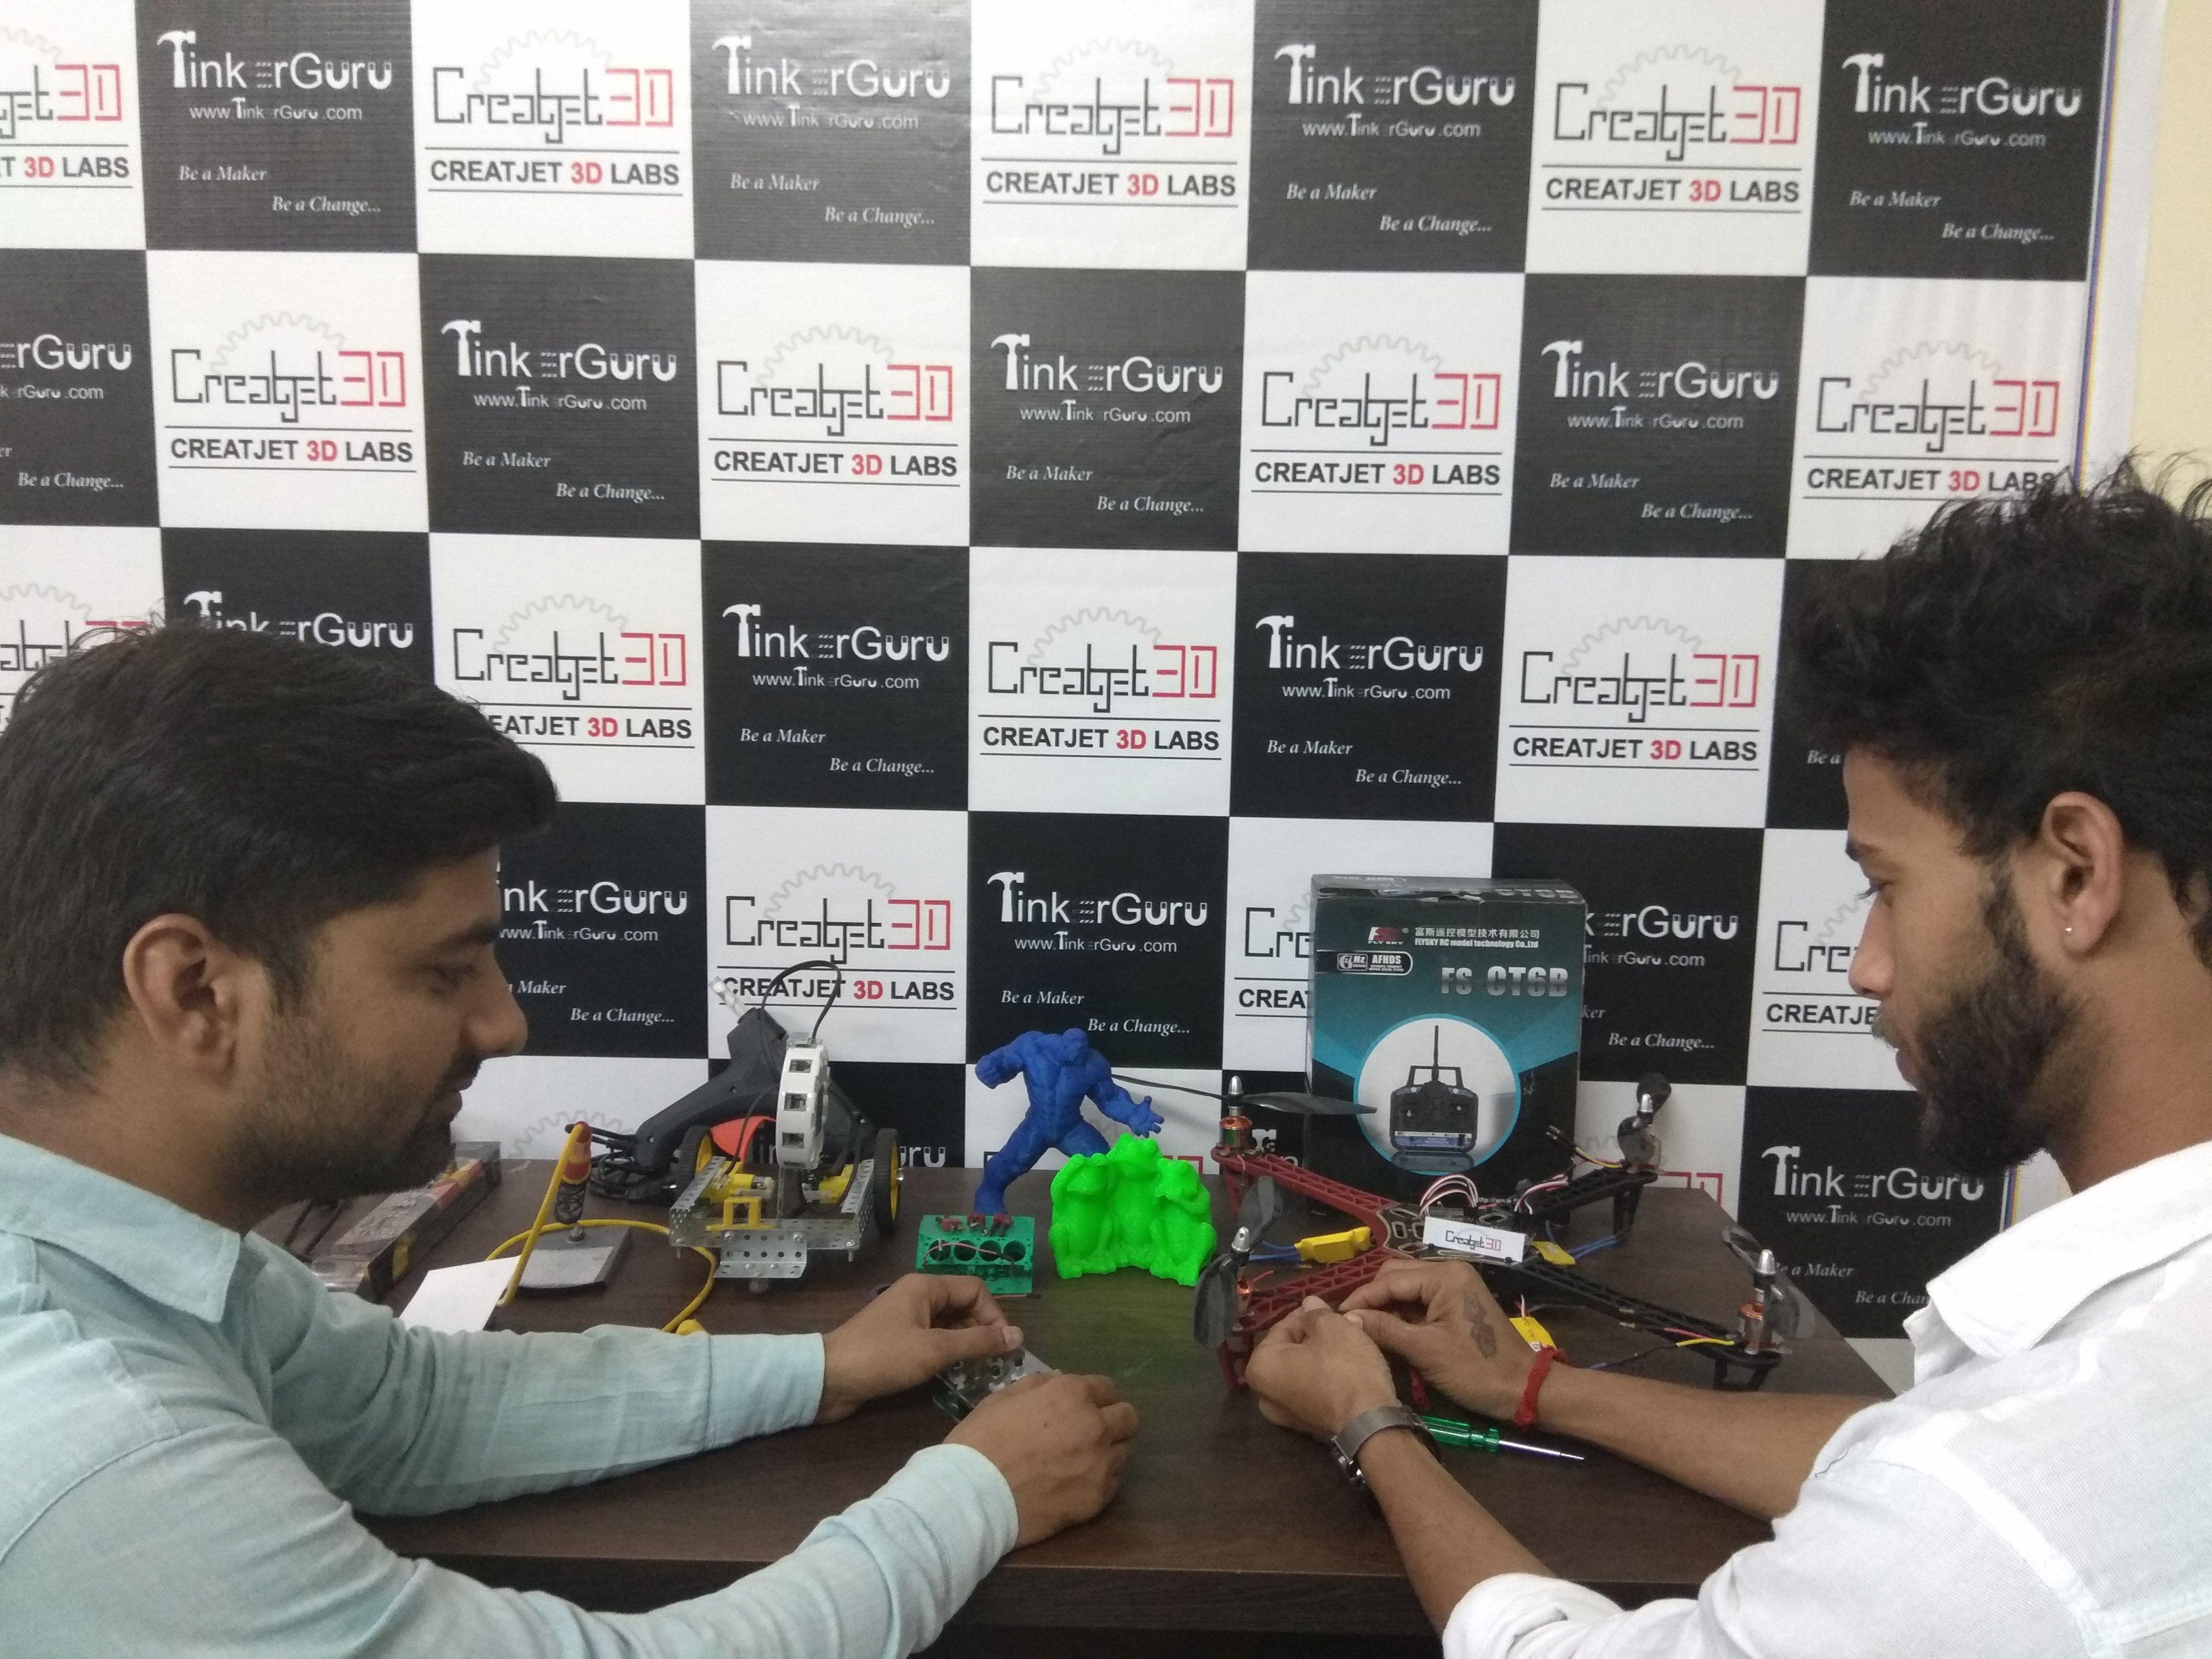 Creatjet 3d labs working on diy drone project diy